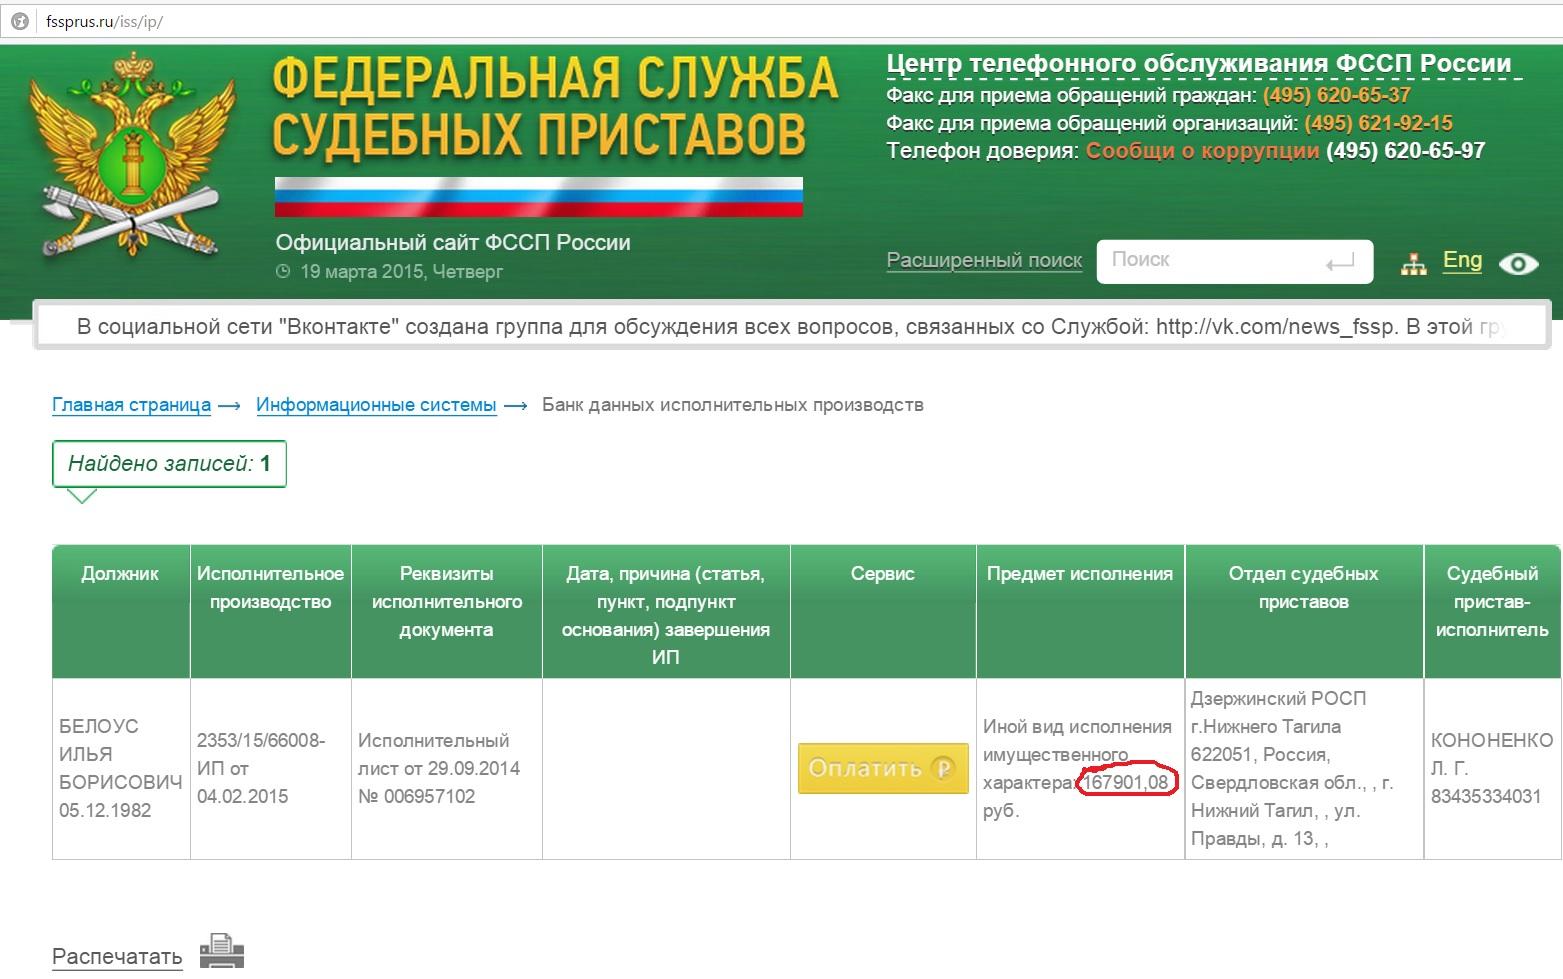 Парфенчиков Щебекин ФССП скандал Белоус Бречалов ОНФ